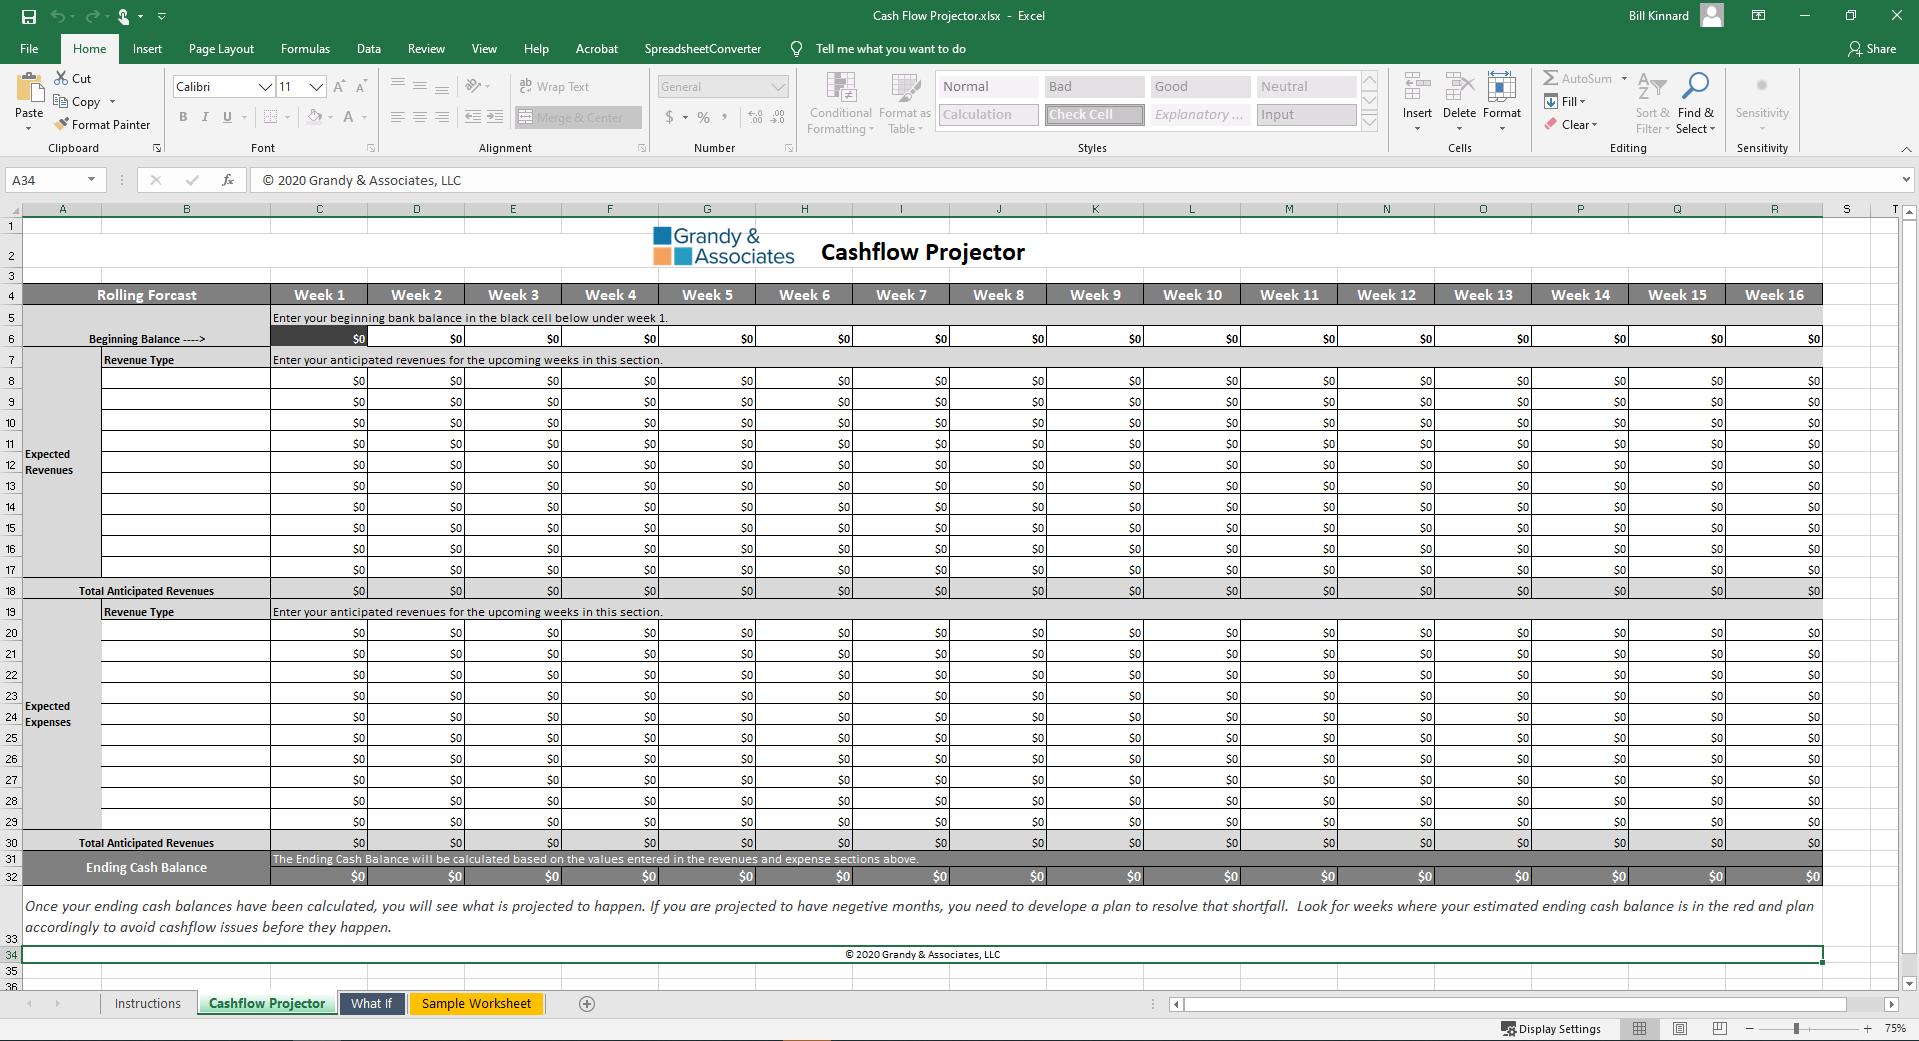 Cashflow Projector Image